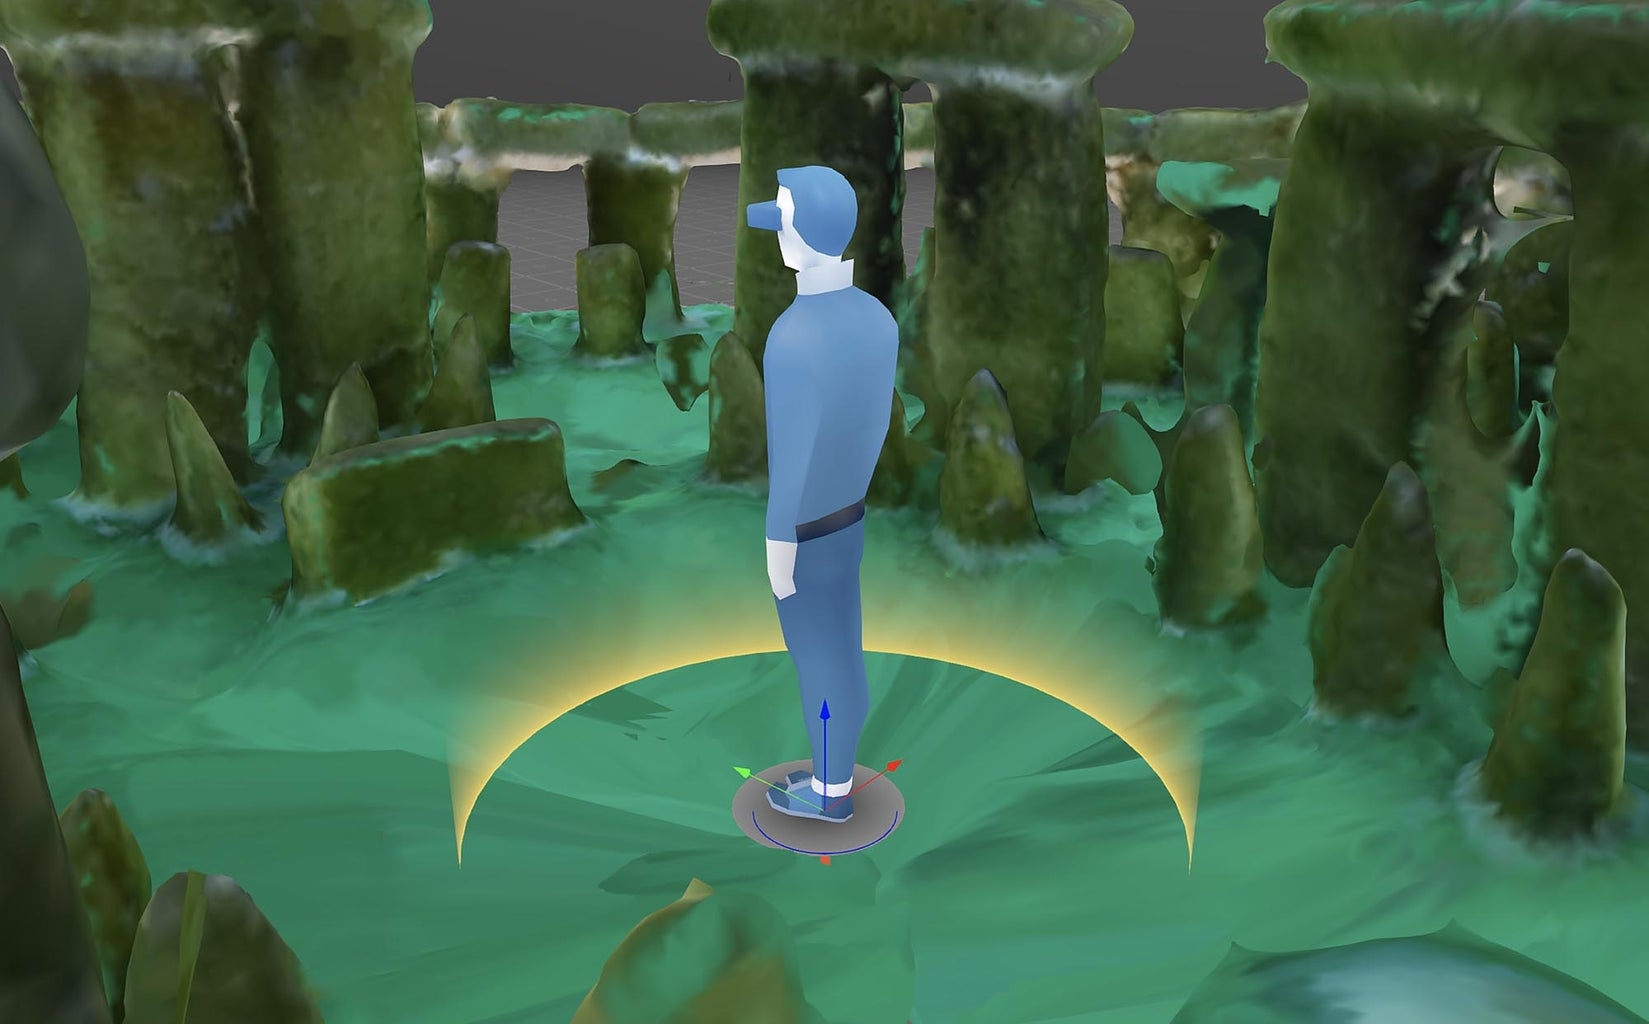 Stonehenge Pastiera Pie - 3D and Immersive View